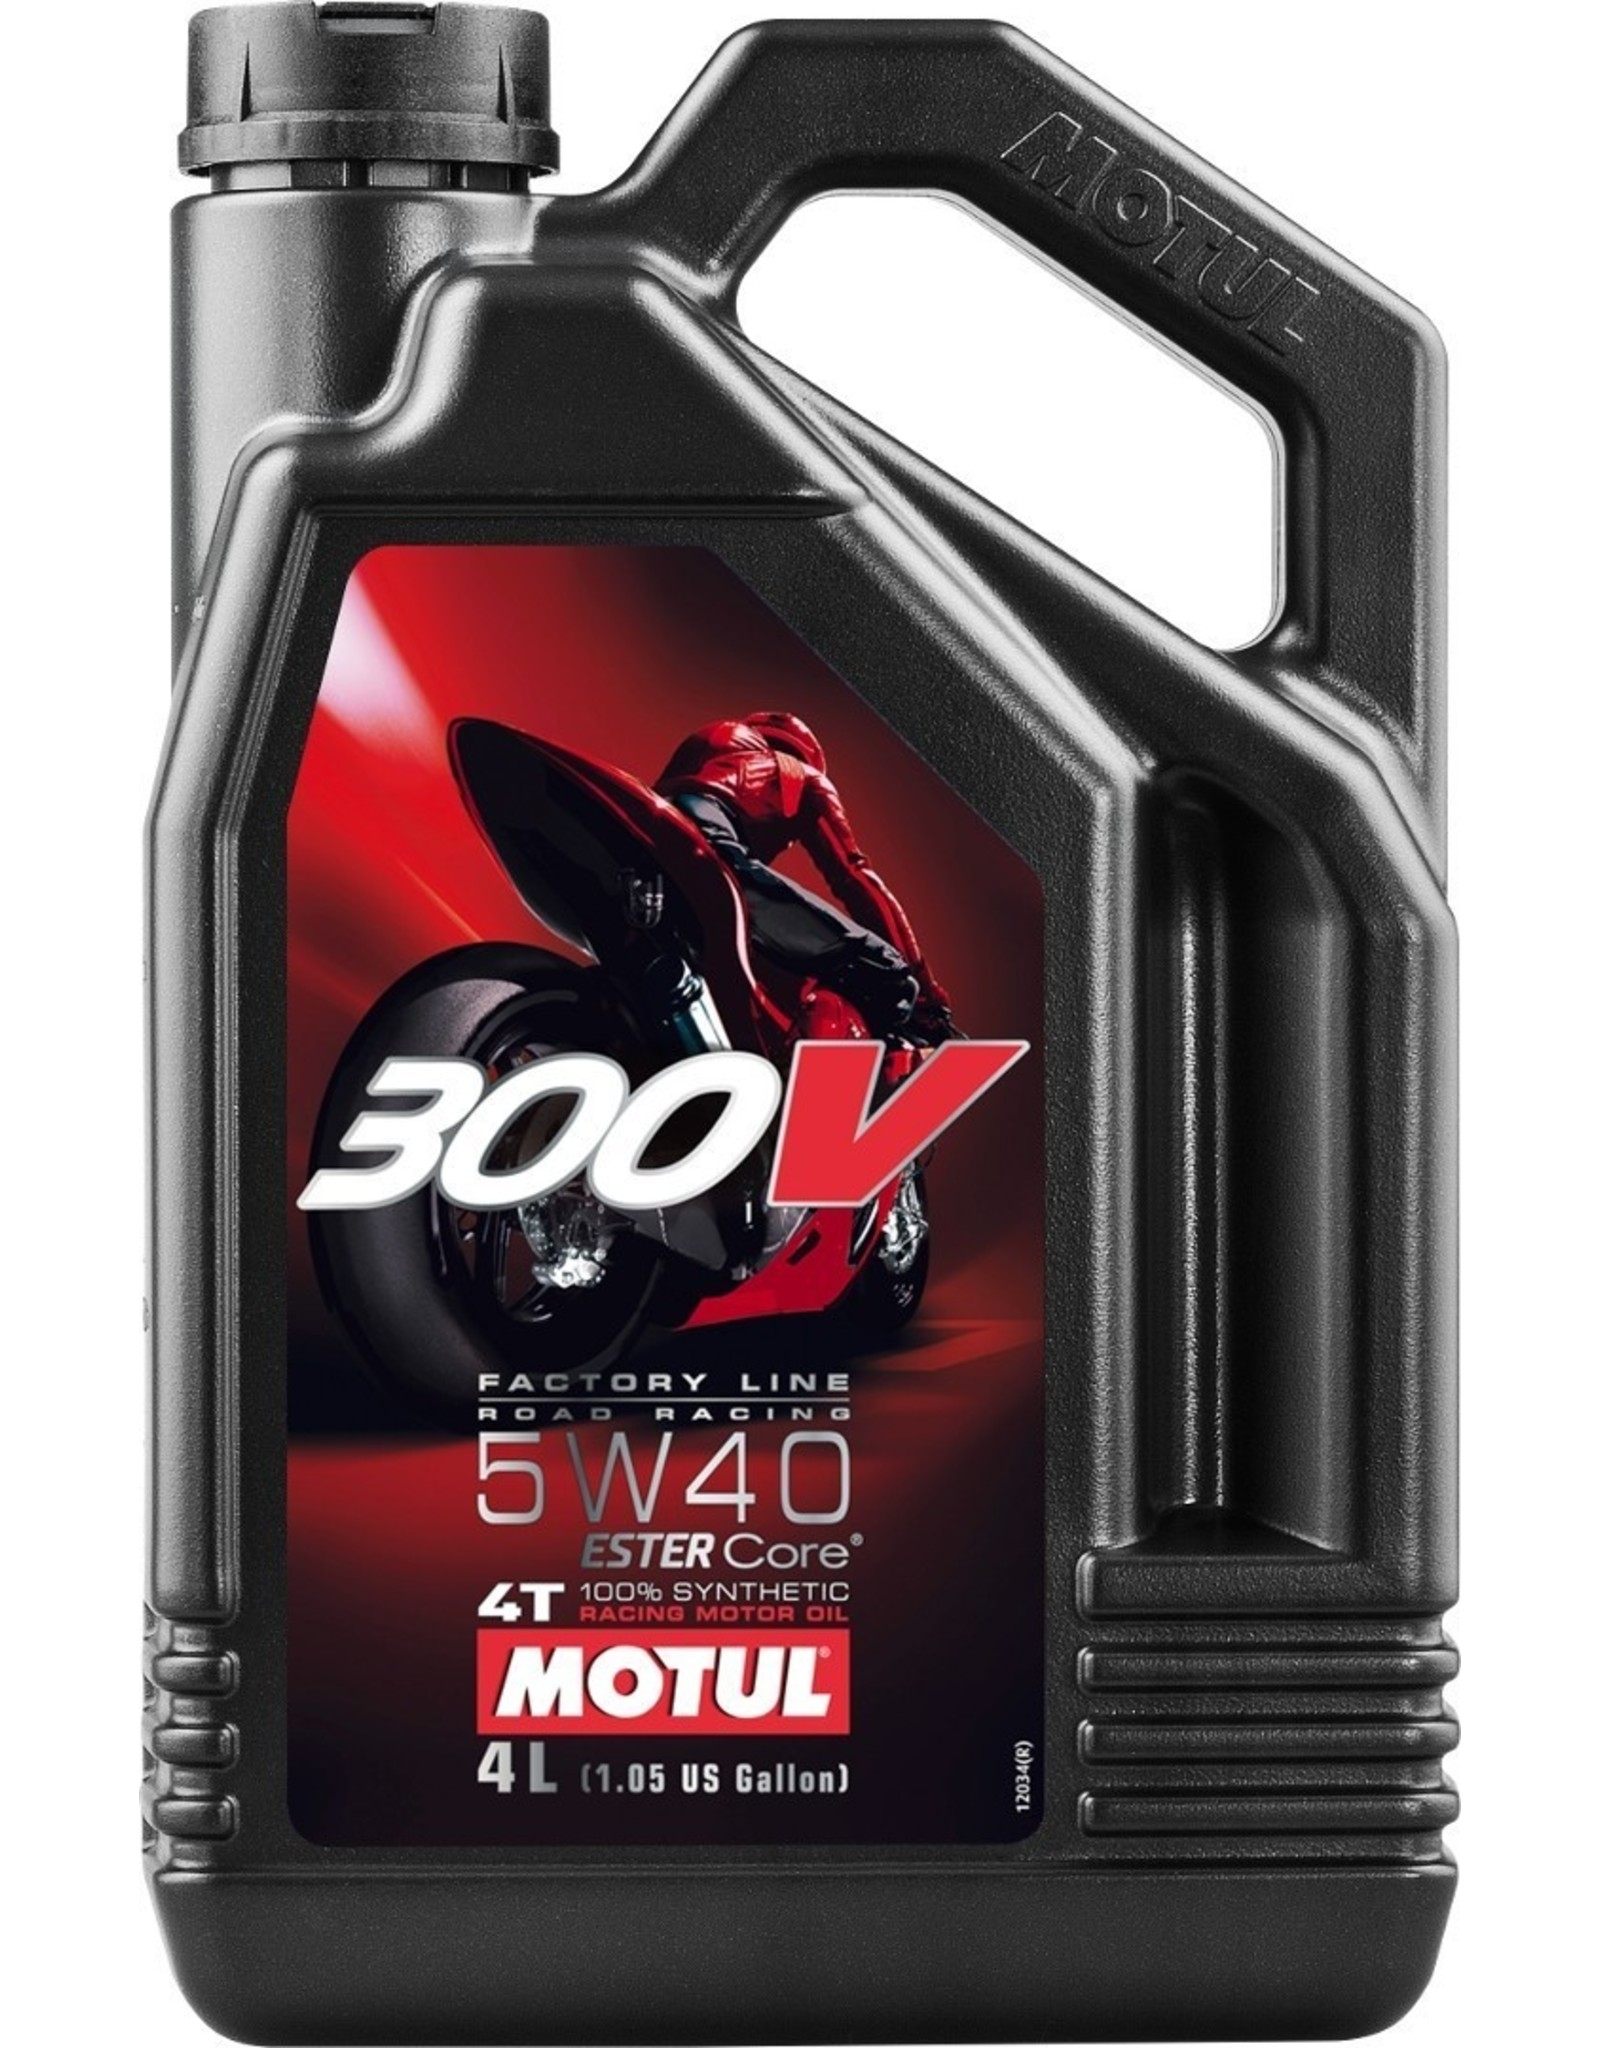 Motul Oil Motul 5W40 4 Litres (v4)